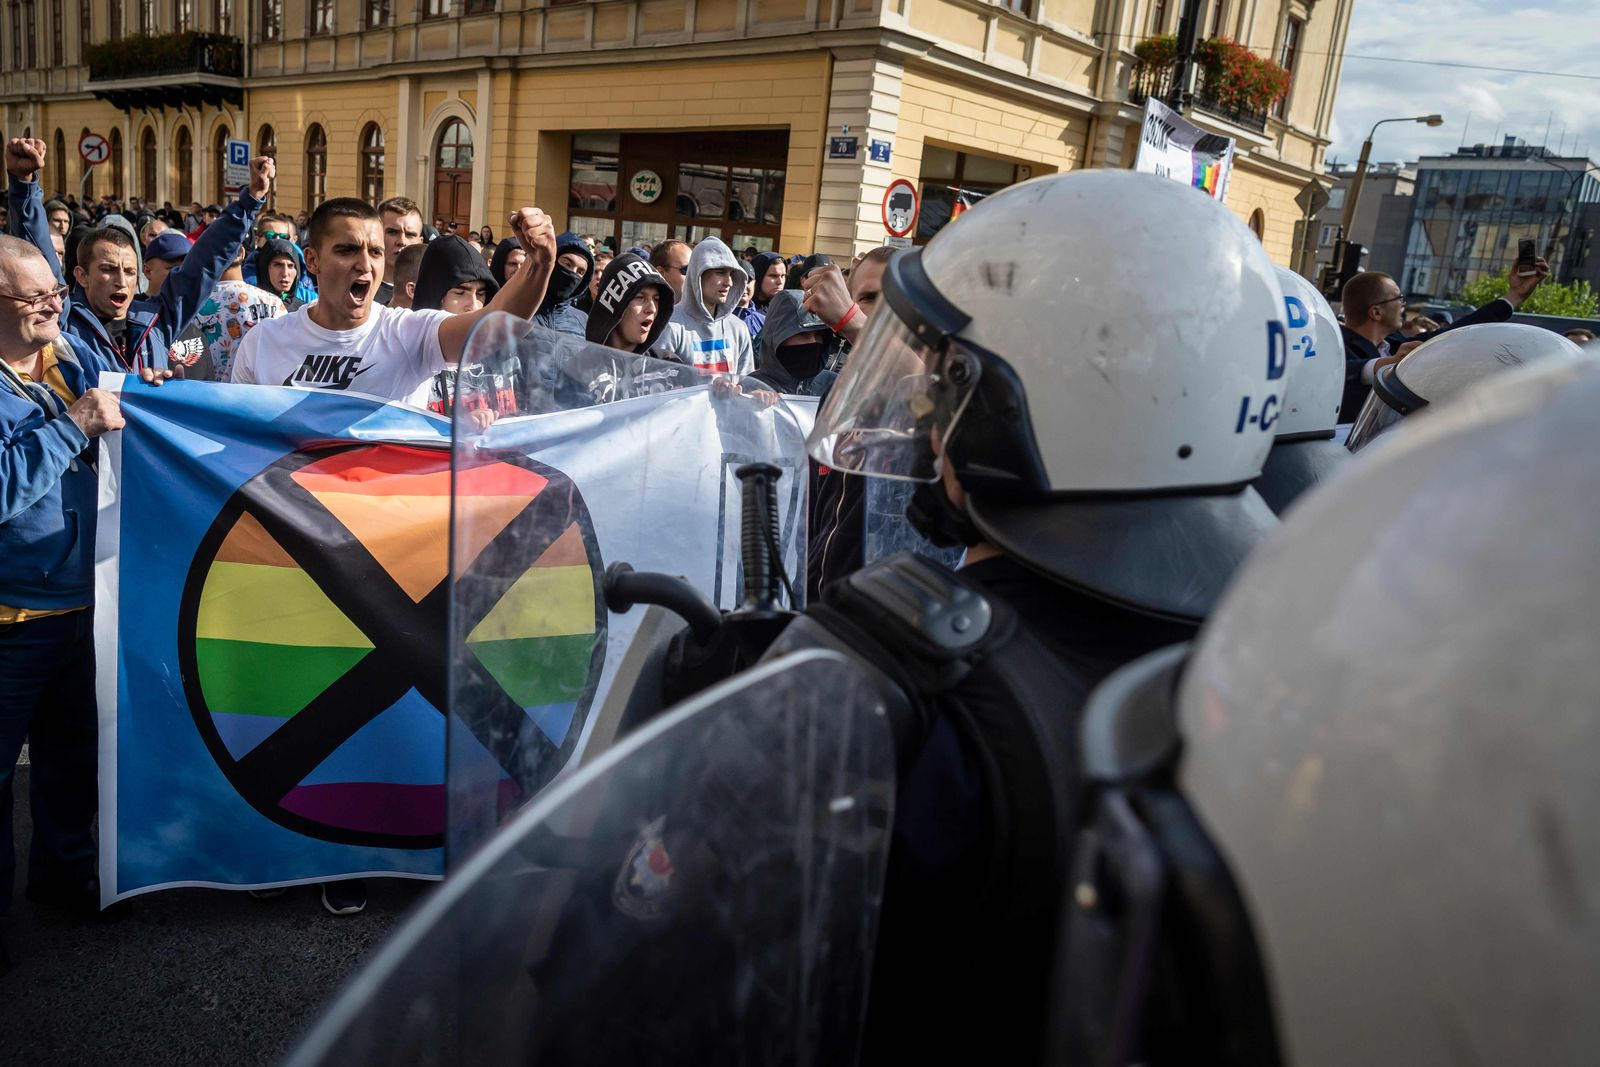 POLAND-SOCIETY-LGBT-PRIDE